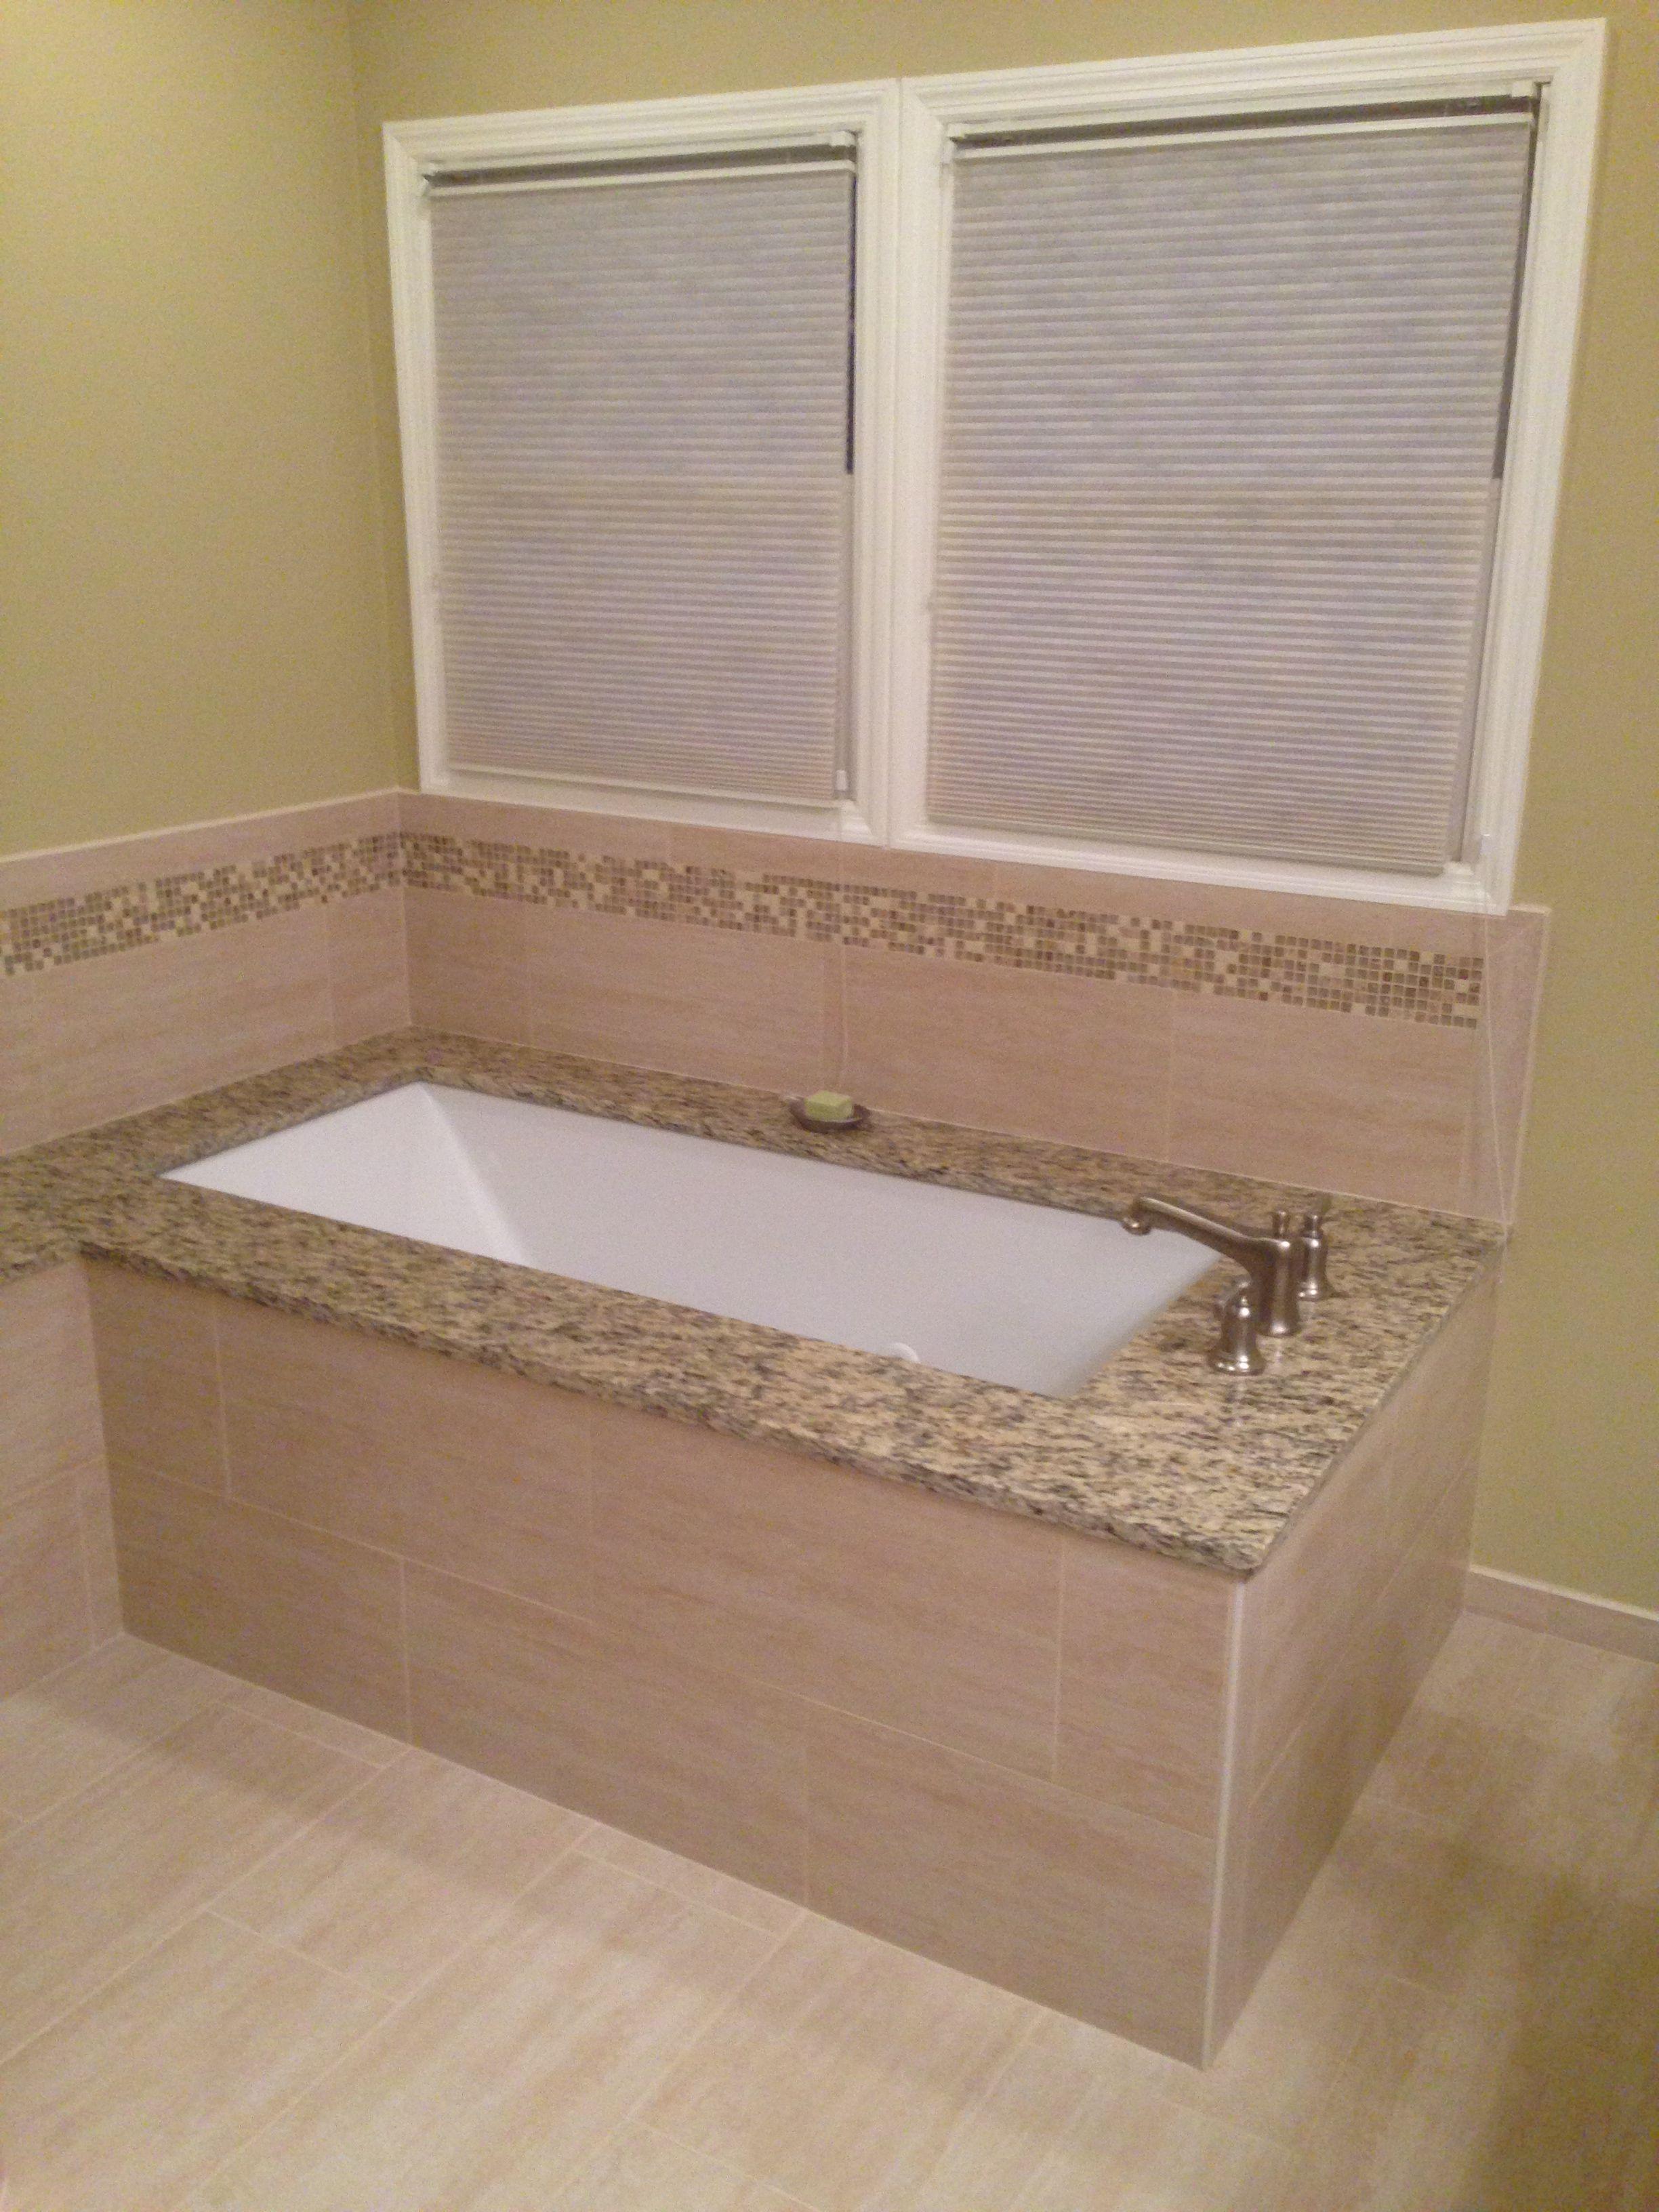 Miraculous Under Mount Soaking Tub With Granite Top Bathroom Download Free Architecture Designs Intelgarnamadebymaigaardcom